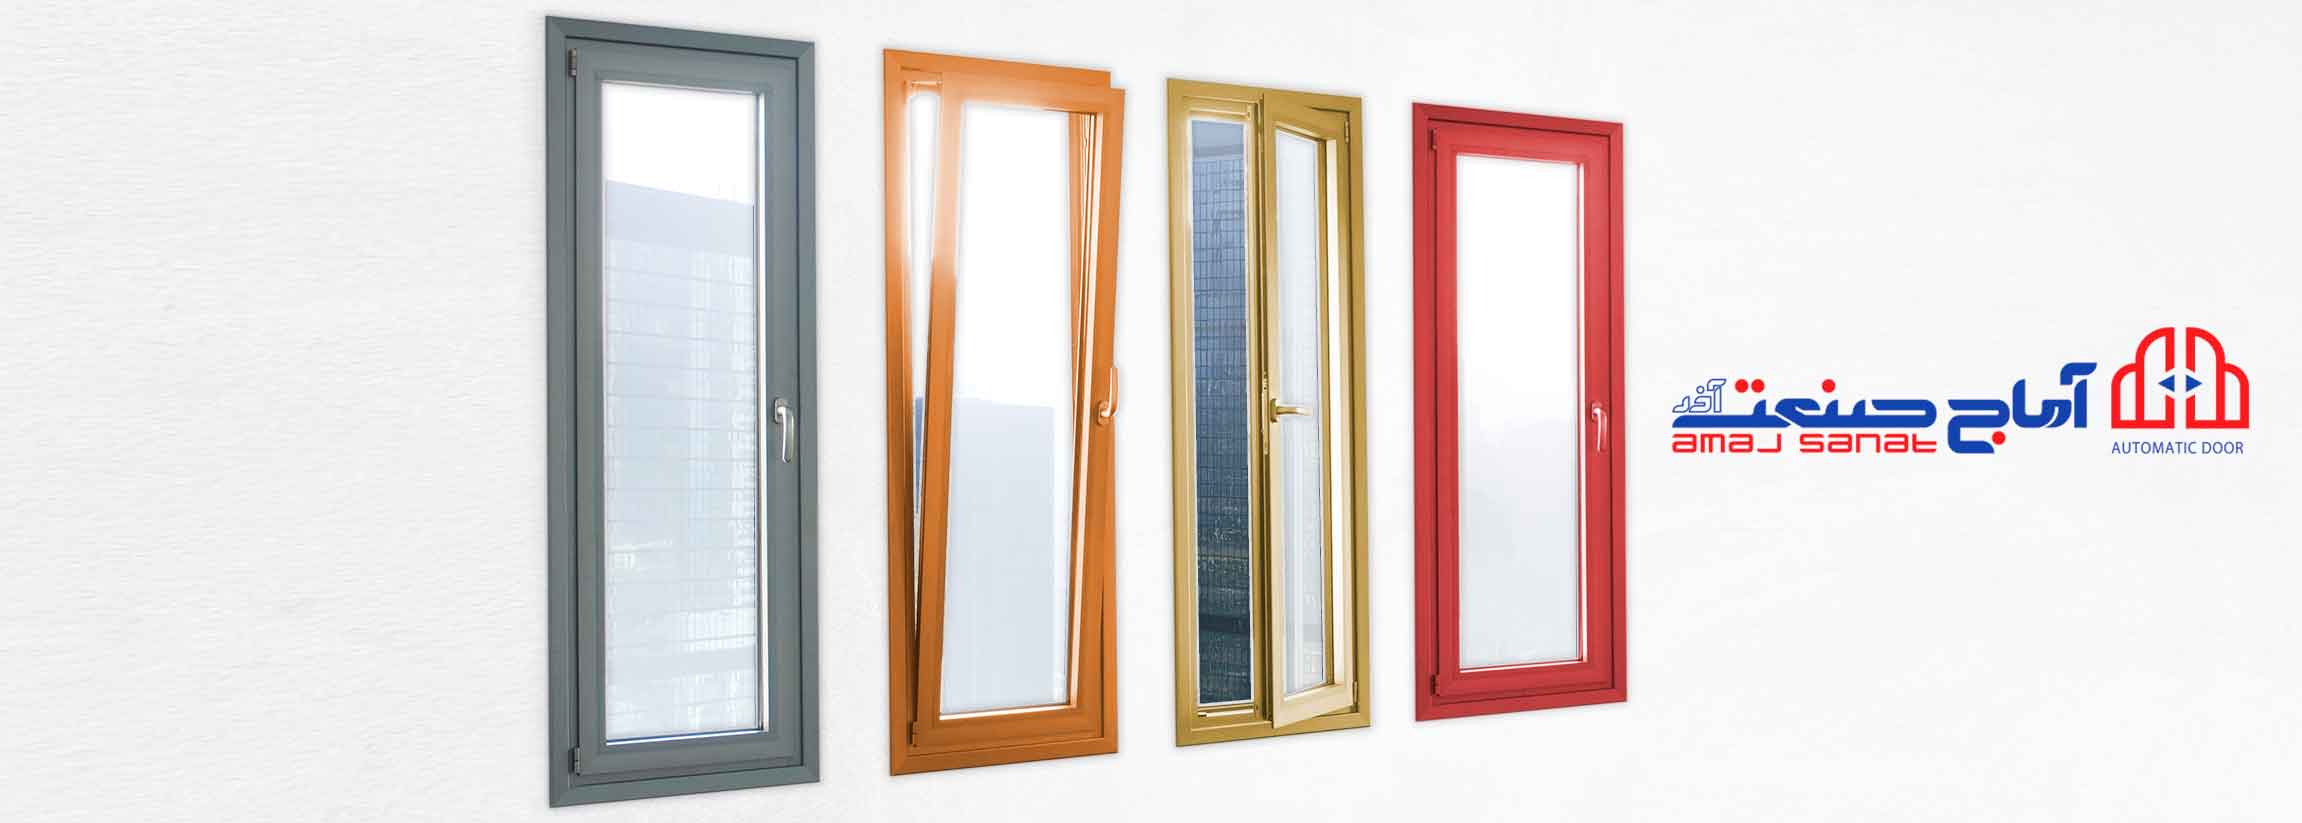 درب-و-پنجره-یو-پی-وی-سی-رنگی-آماج-صنعت-(451)